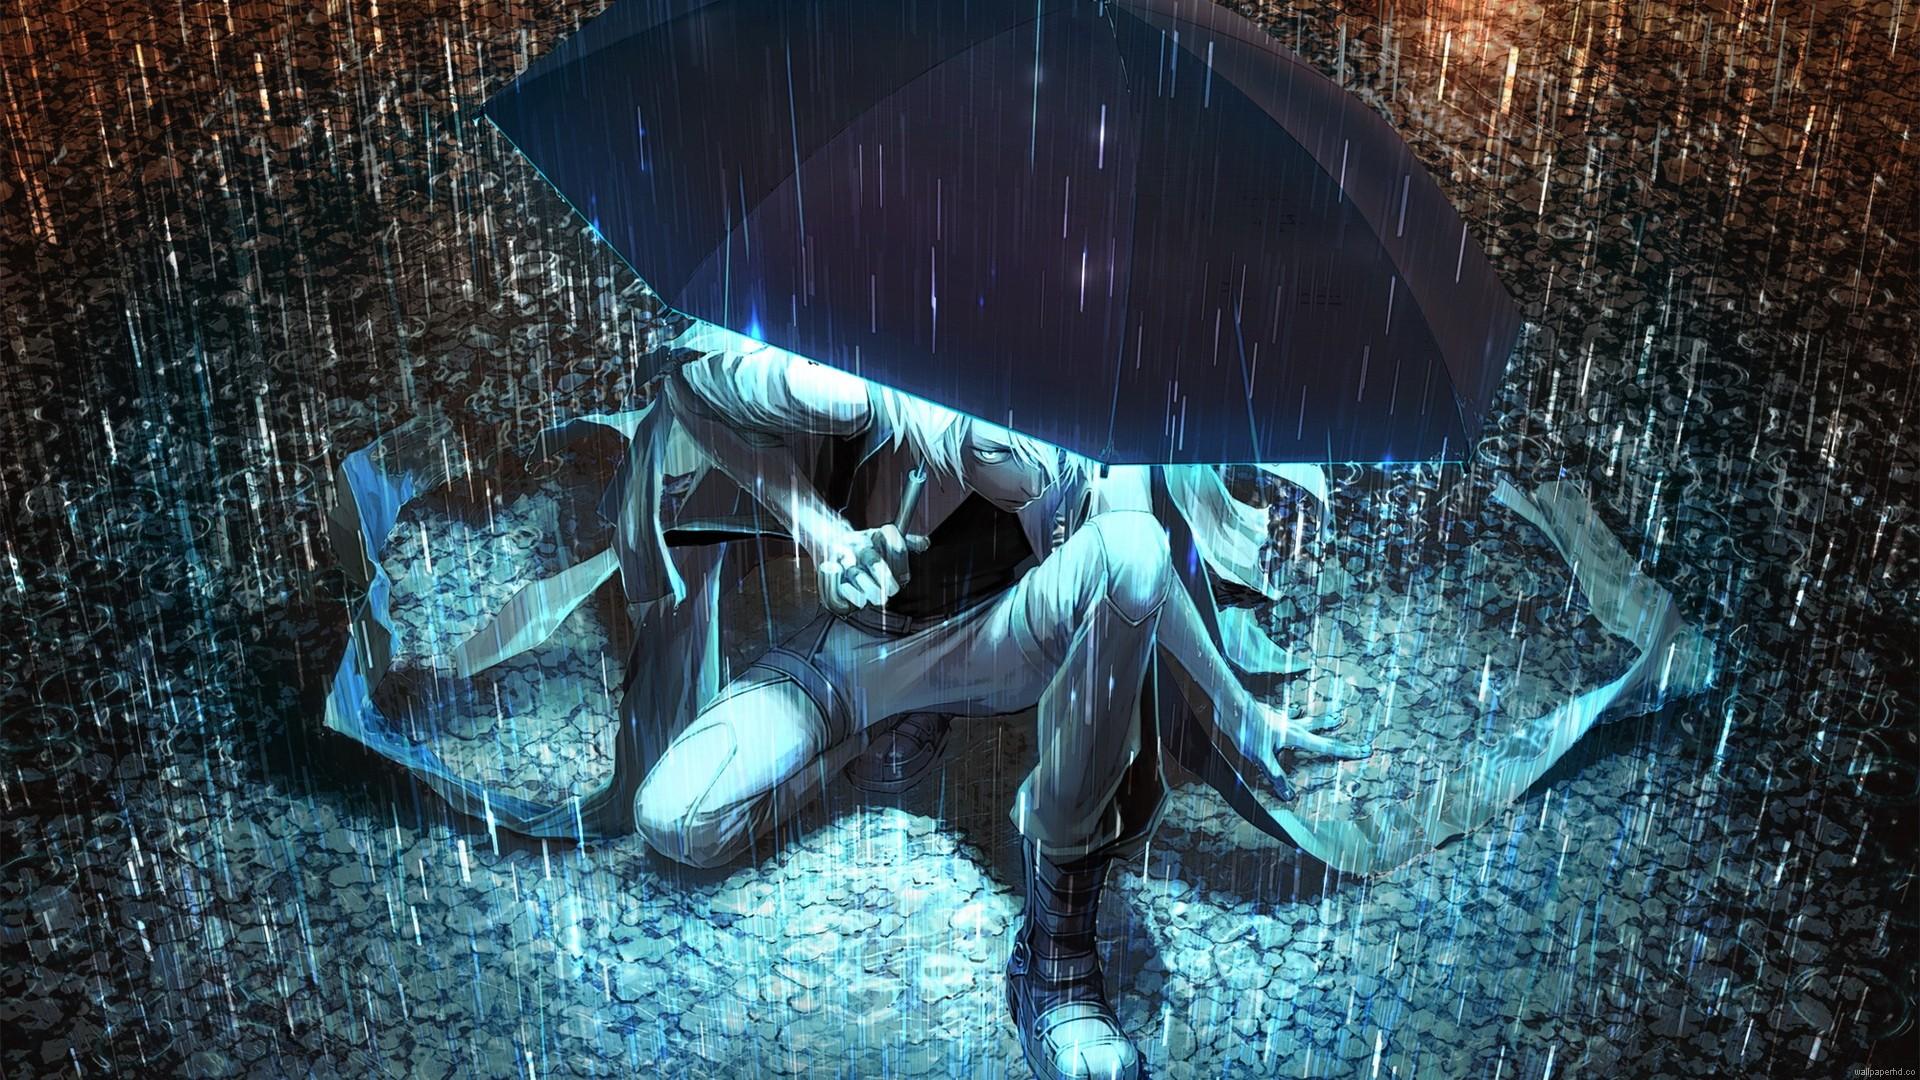 Best Anime Wallpaper Hd iCon Wallpaper HD · Cool Anime GuysAnime …